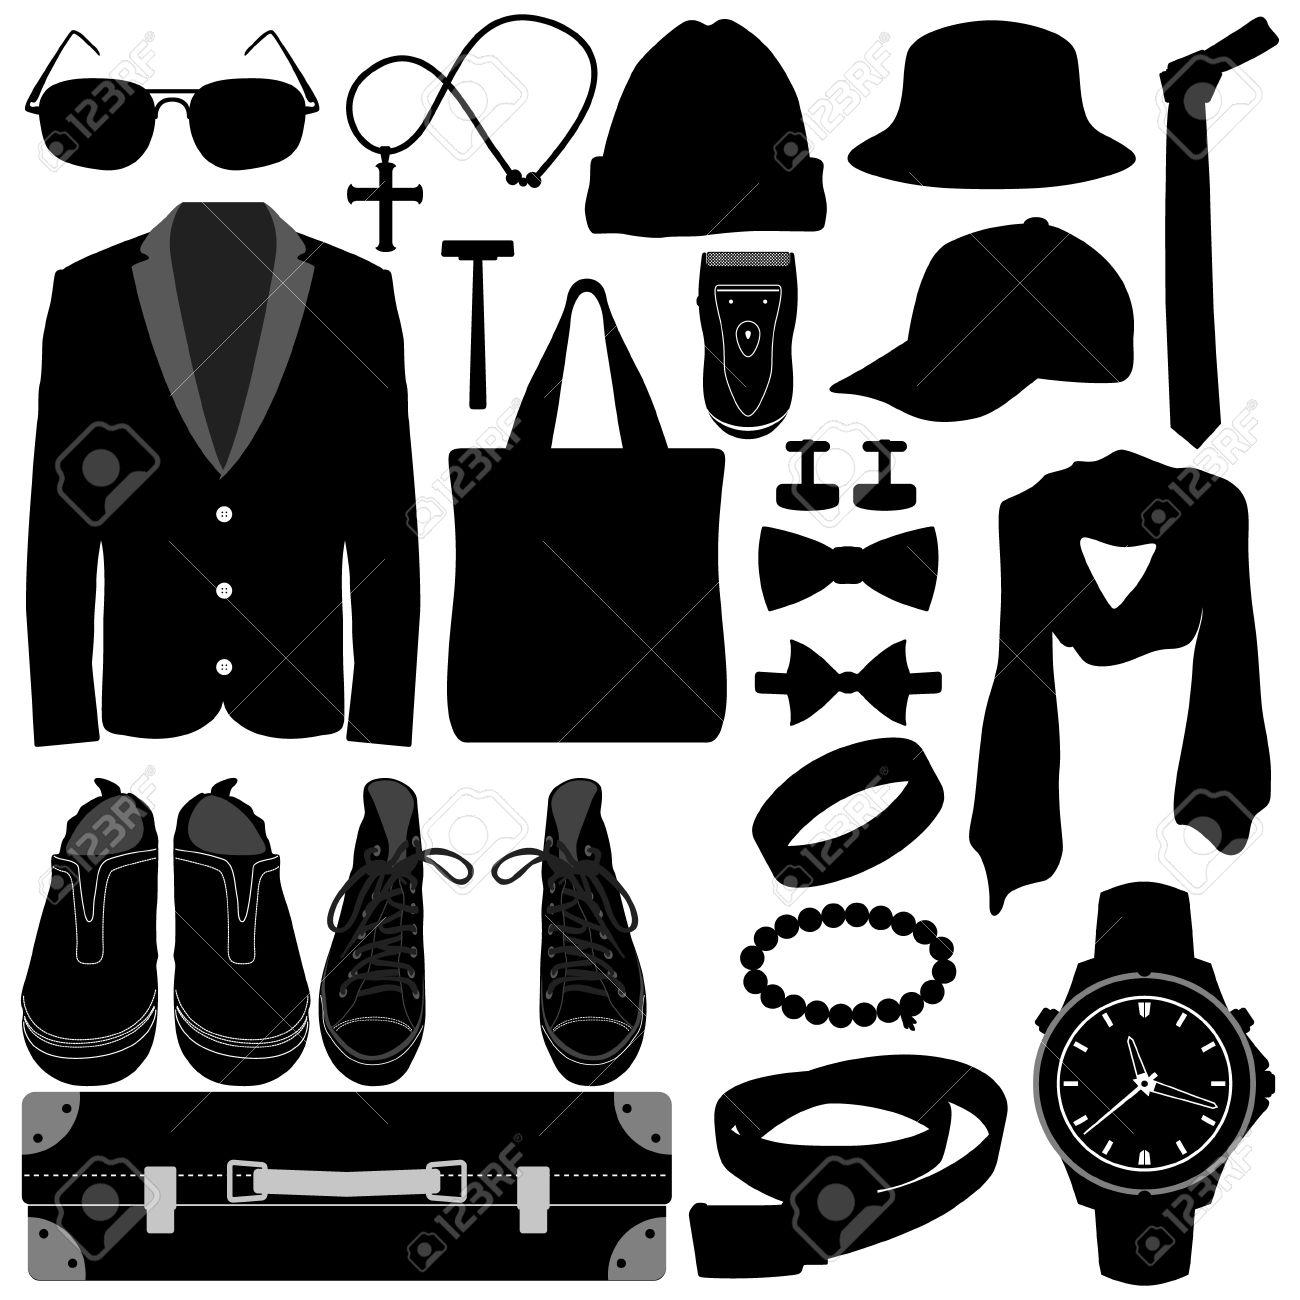 b8e5d306c24 Man Male Clothing Wear Accessories Fashion Design Stock Vector - 14446306